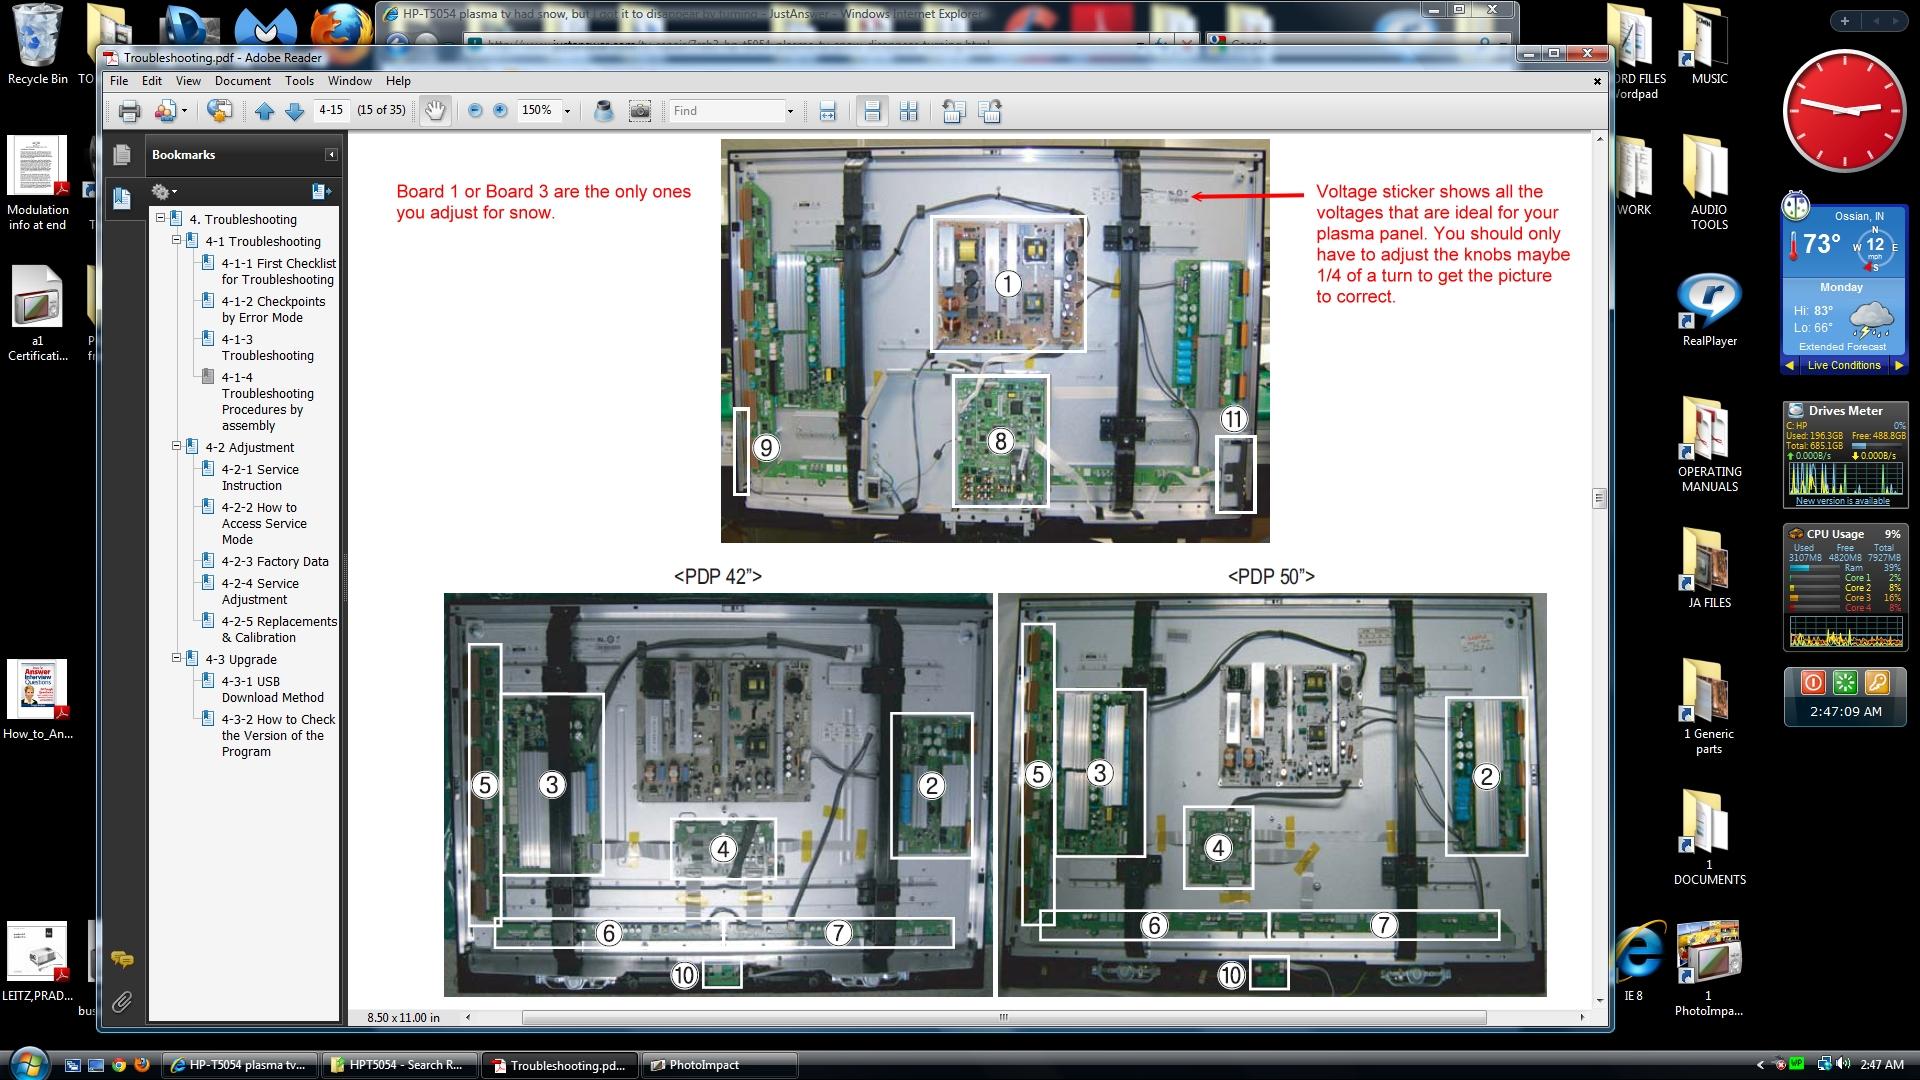 Aqw hack 2014 free download. como crackear elfbot 8.60 no windows 8. intern